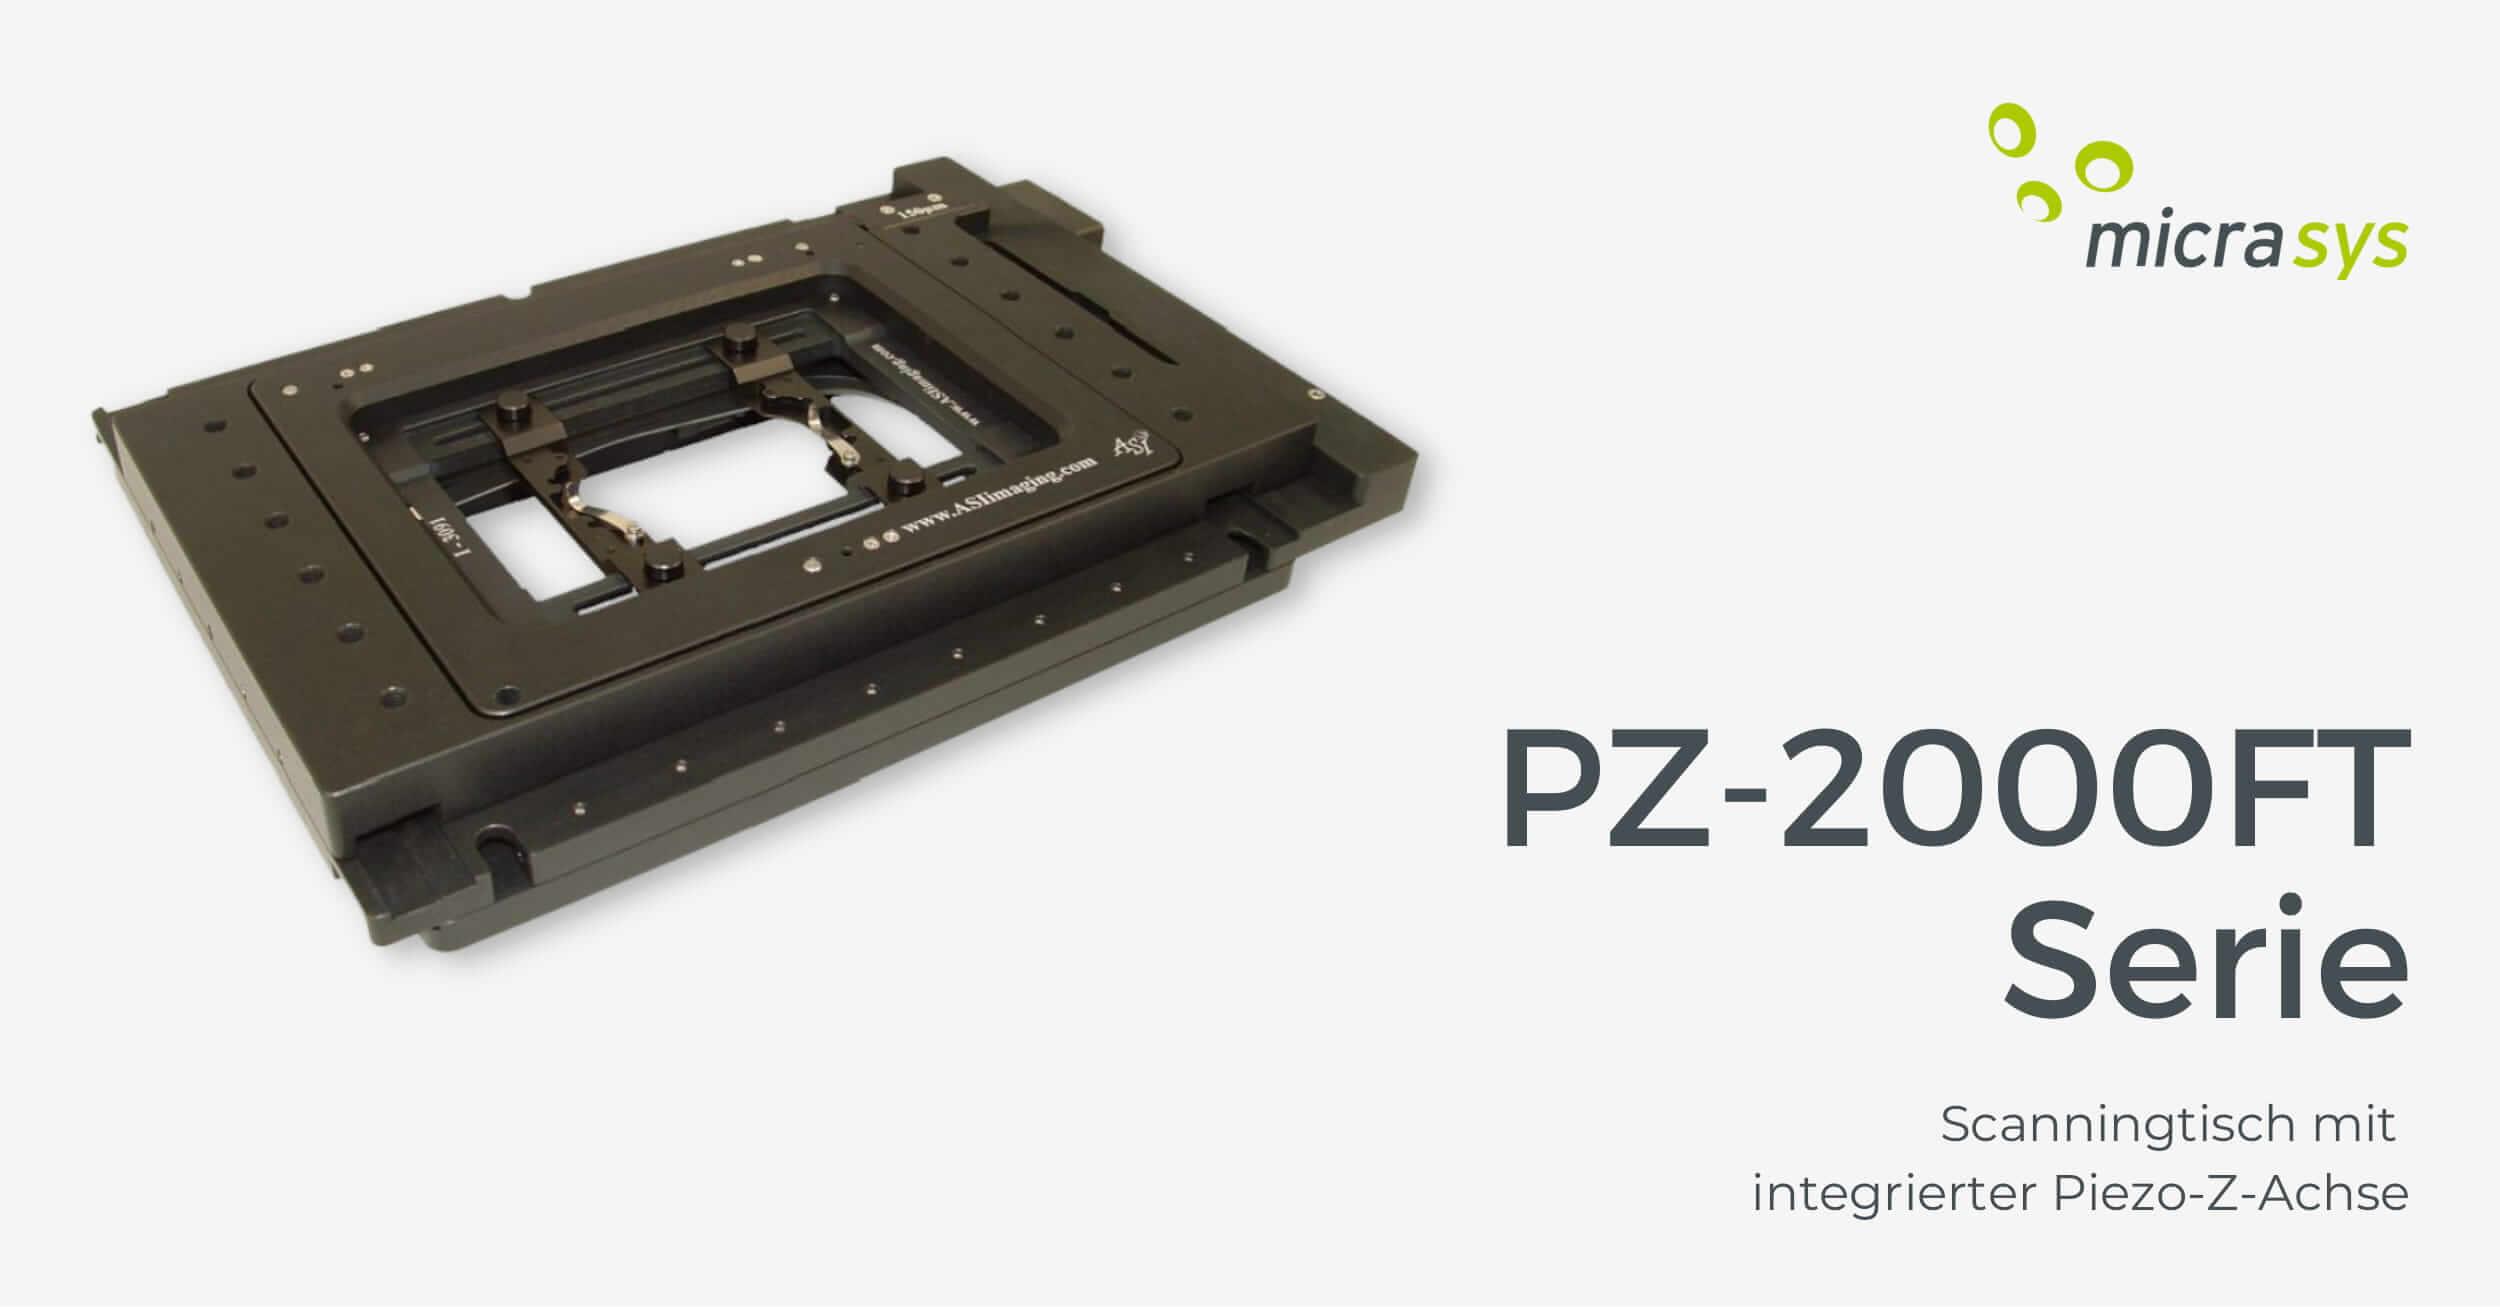 PZ-2000FT Serie